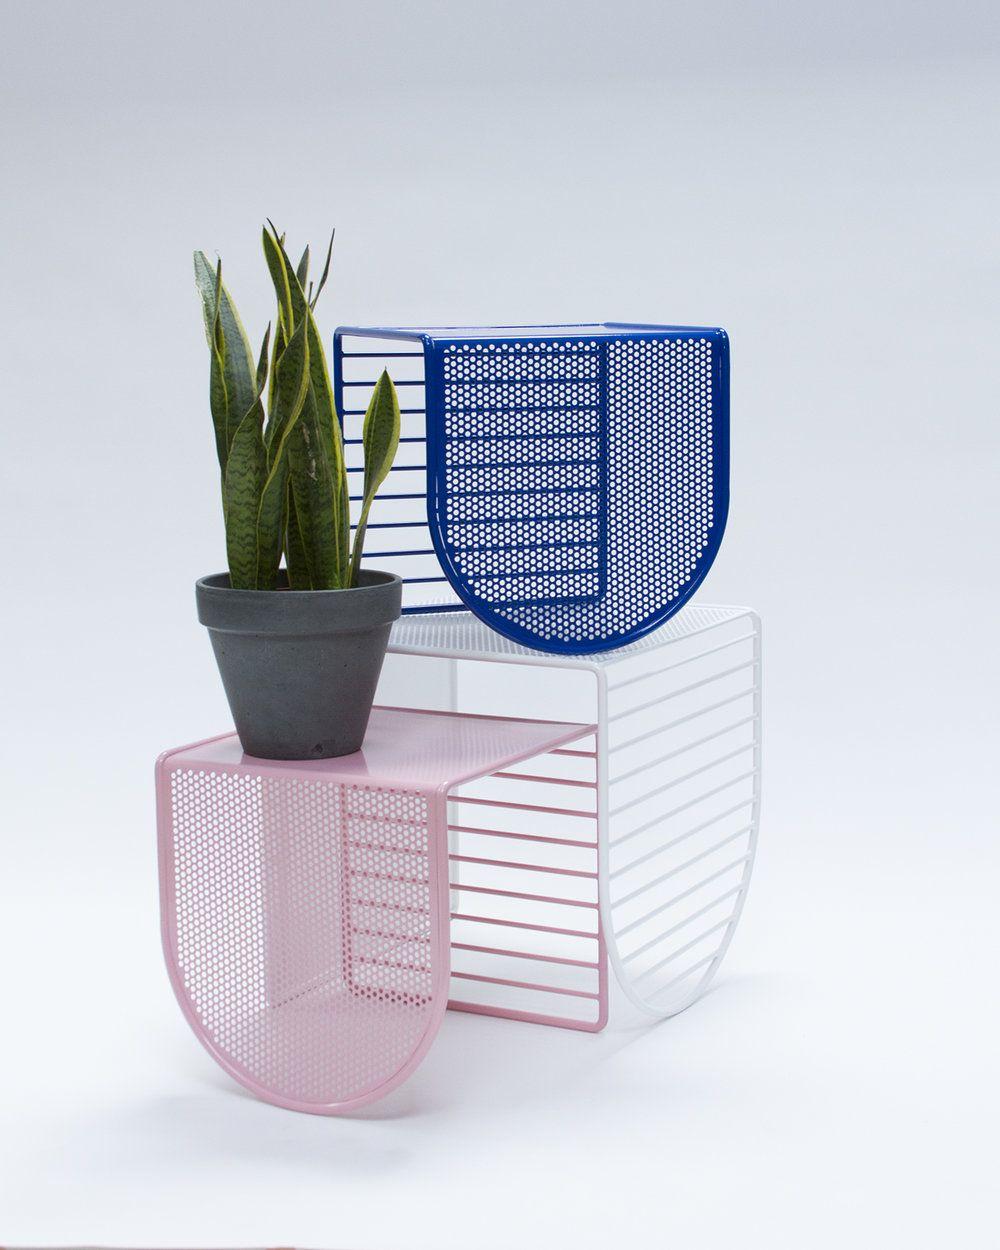 Pop Perf Small Nesting Table Eric Trine Mobilier De Salon New Yorkaise [ 1250 x 1000 Pixel ]